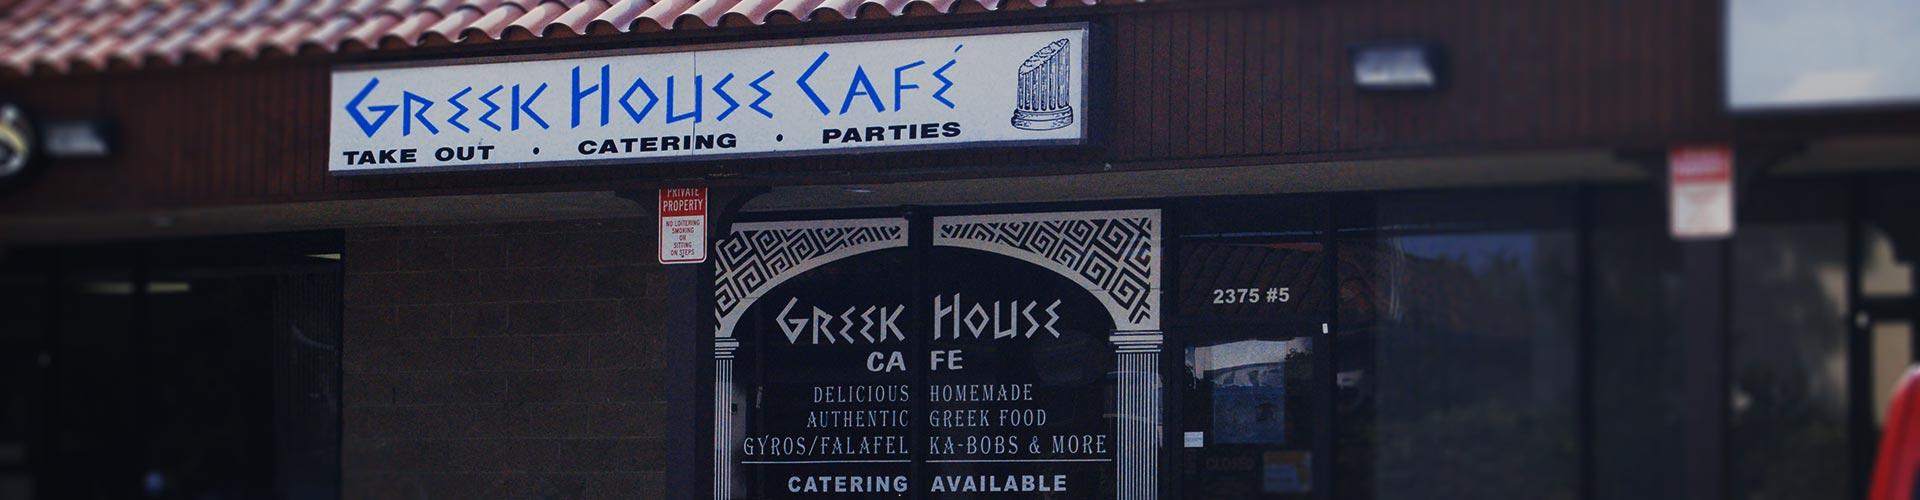 Greekhouse Header